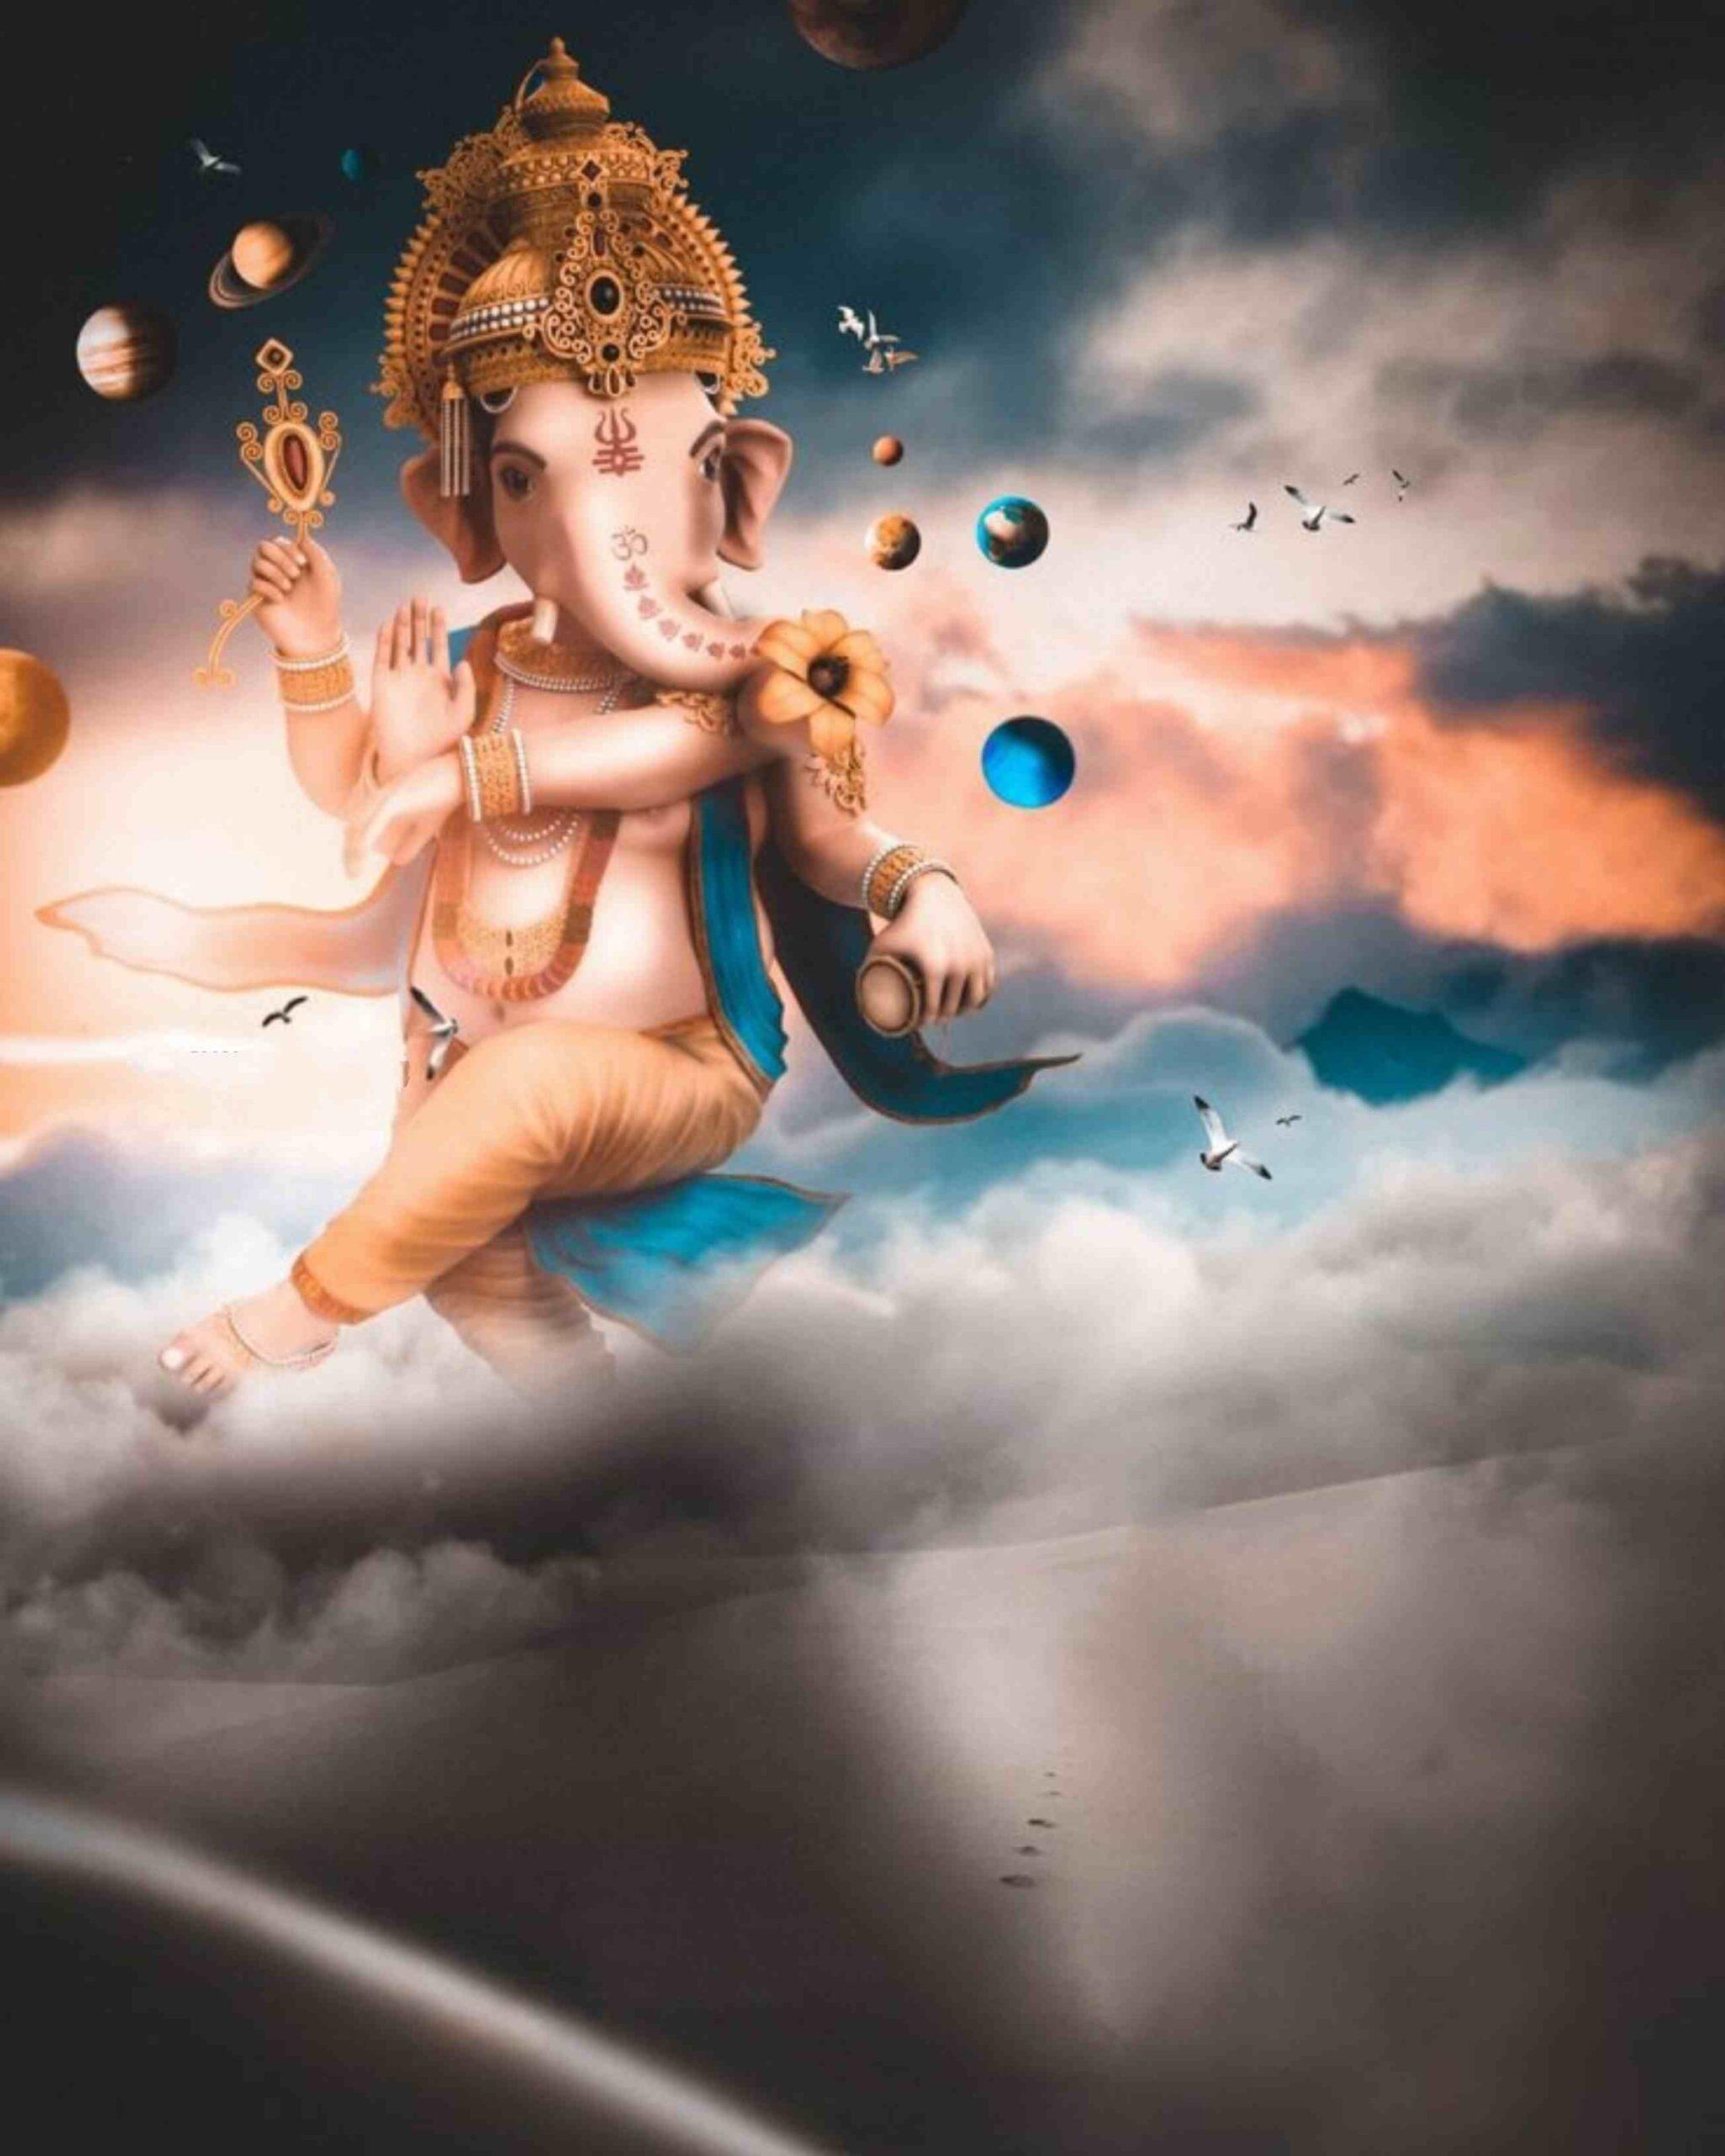 Mangal murti editing background Morya editing background